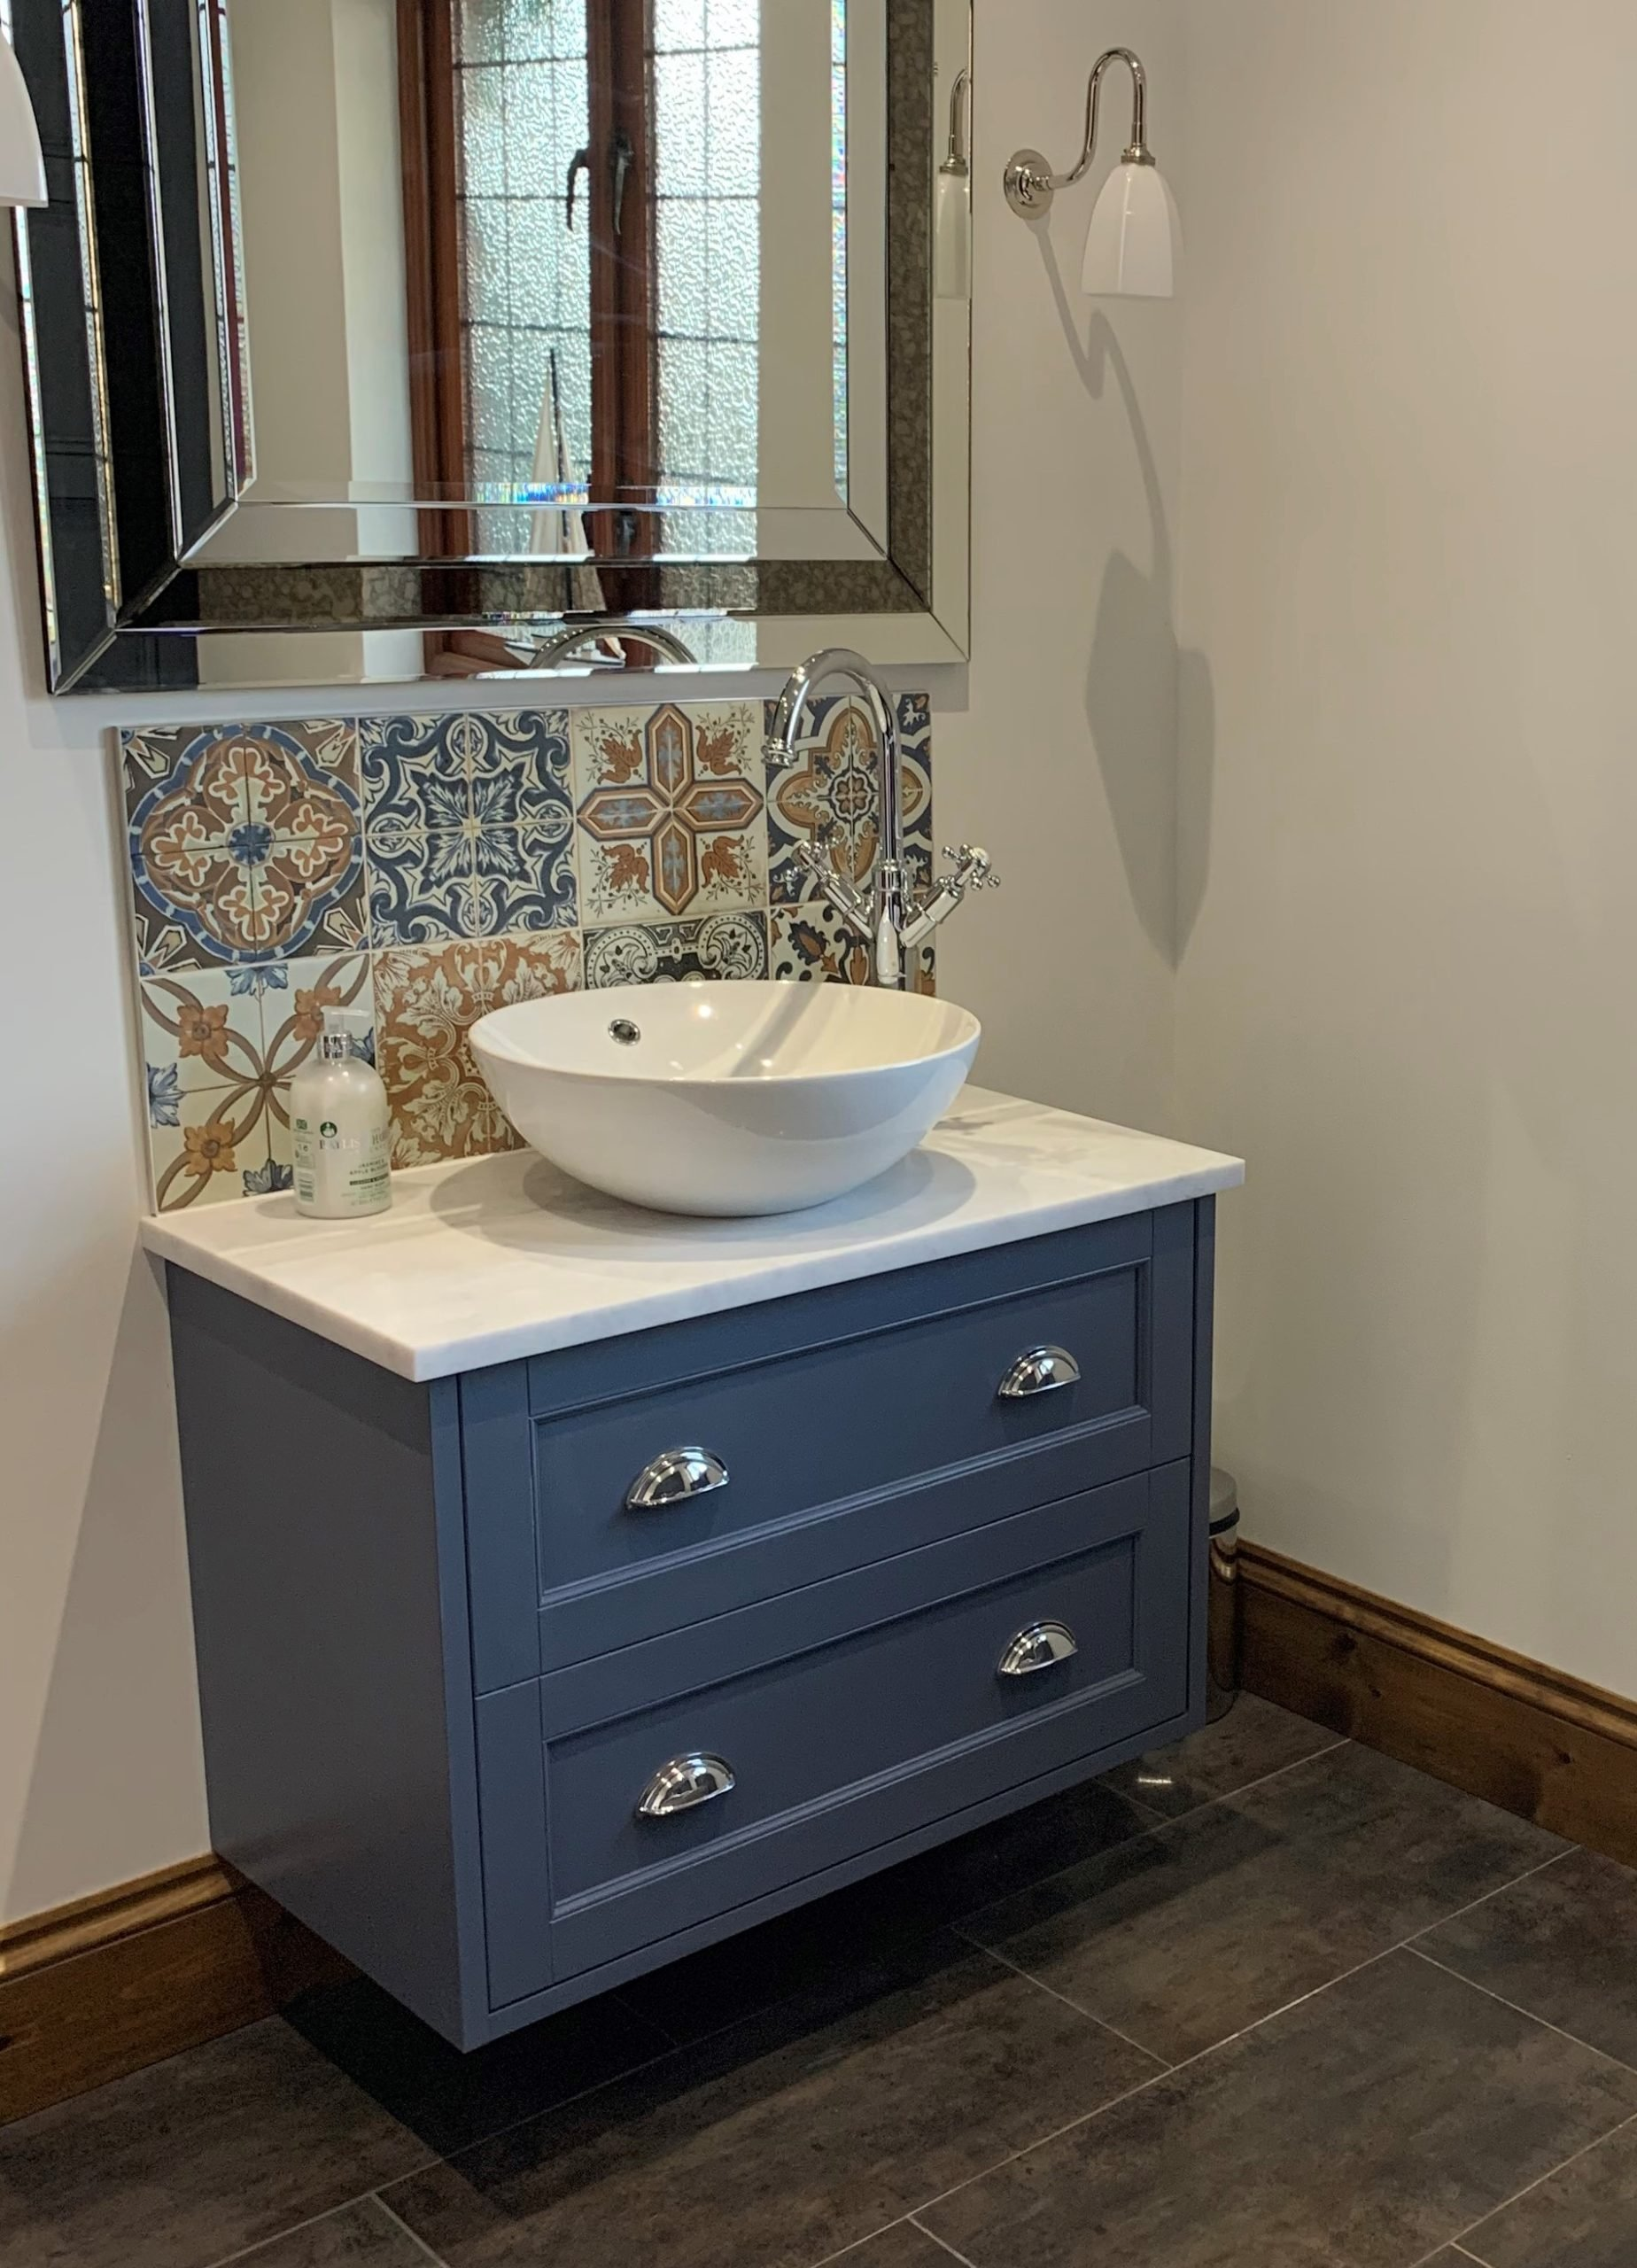 Bold backsplash with Moroccan tile mosaic